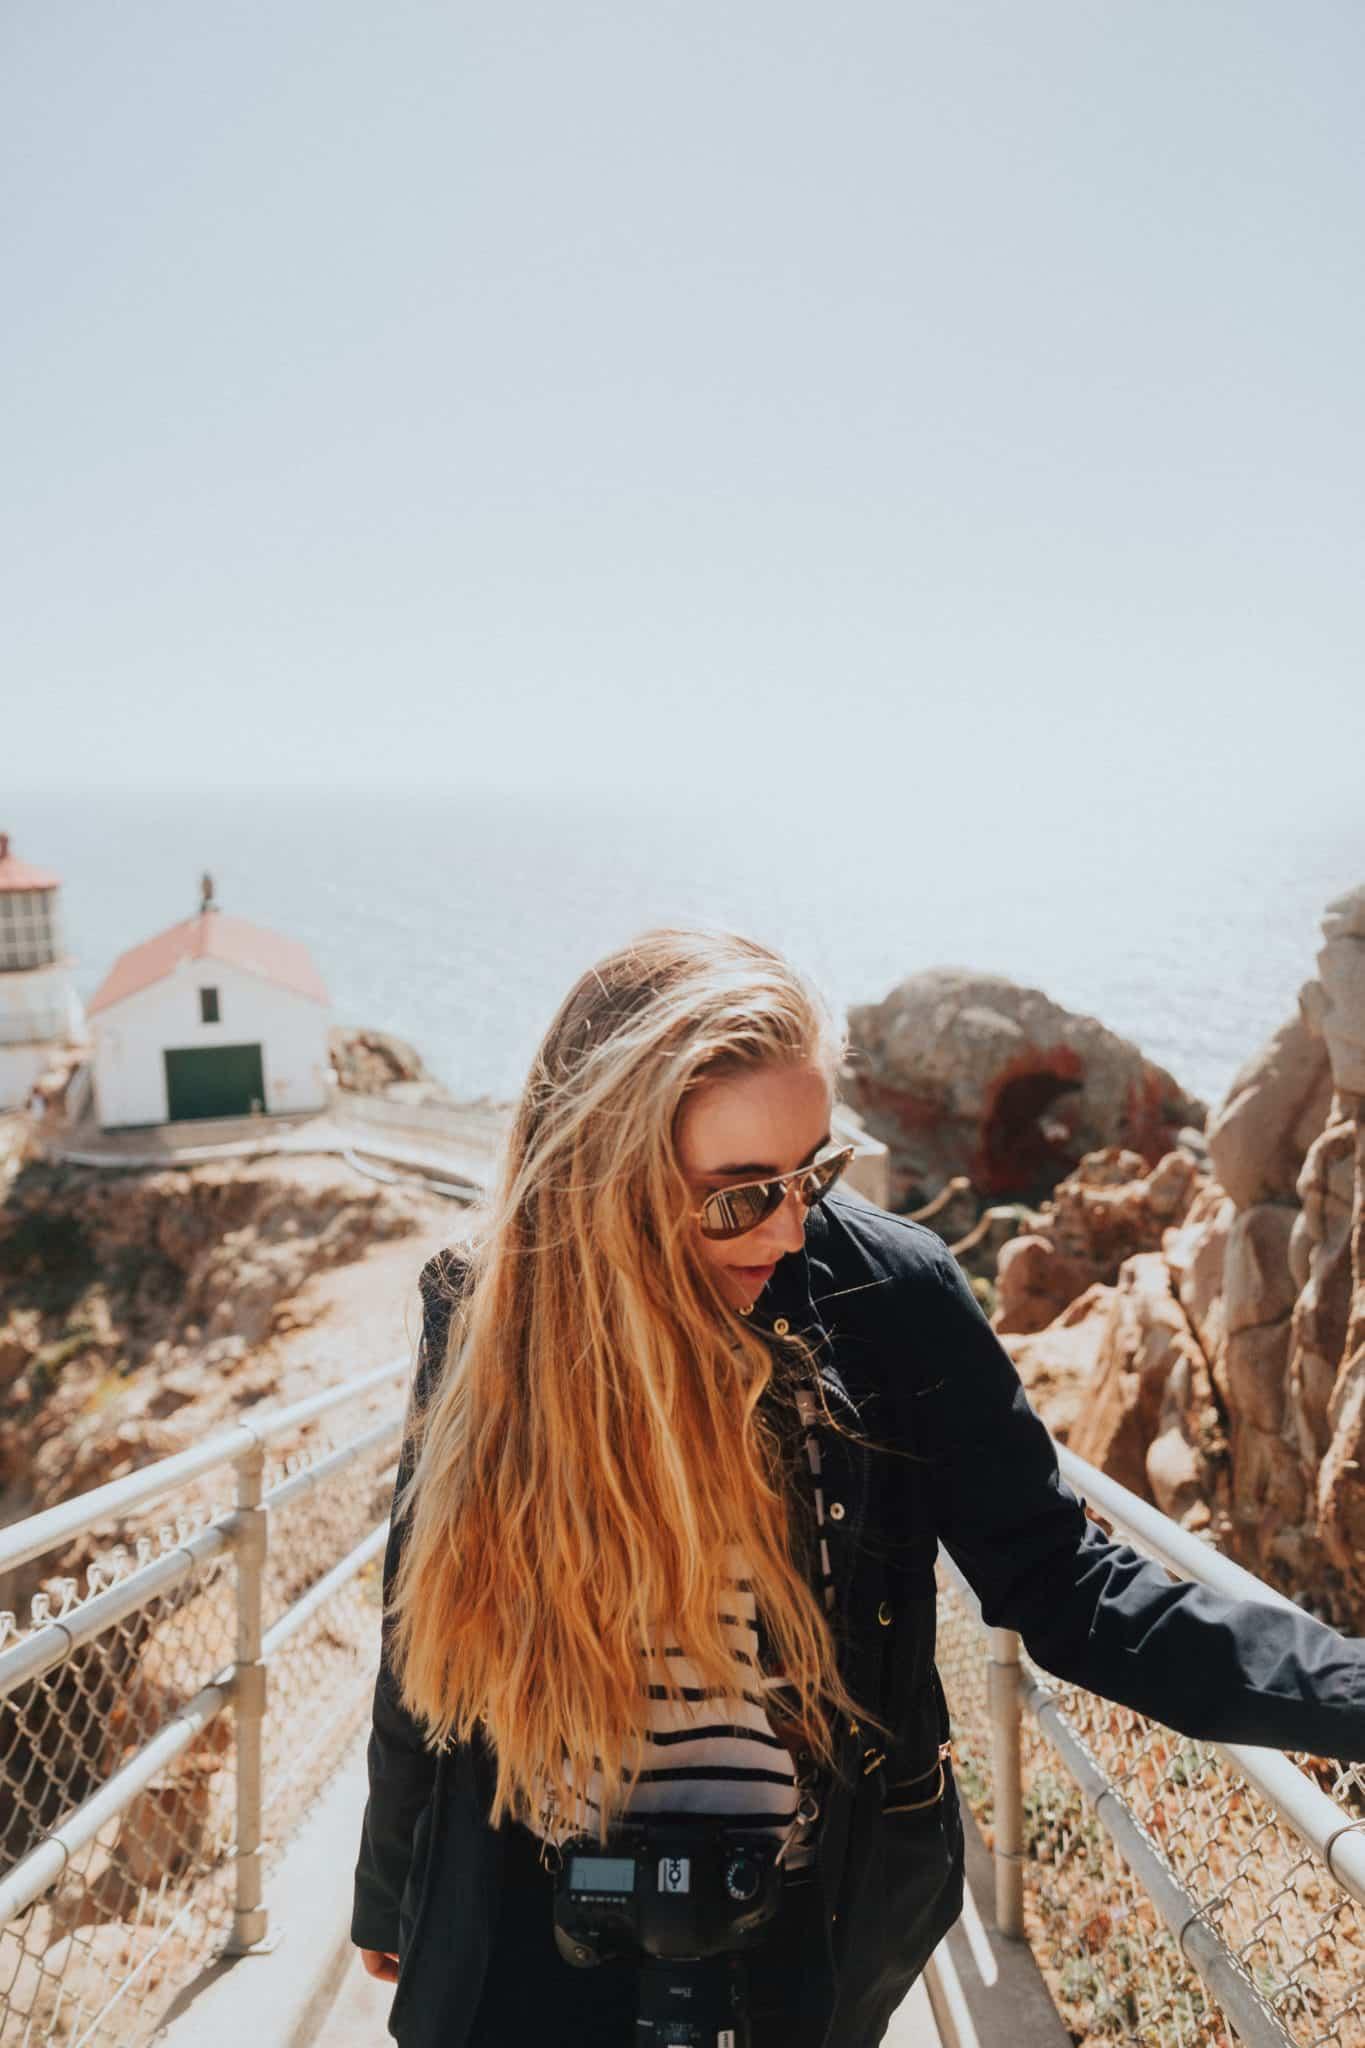 Point Reyes Lighthouse, California - The Mandagies